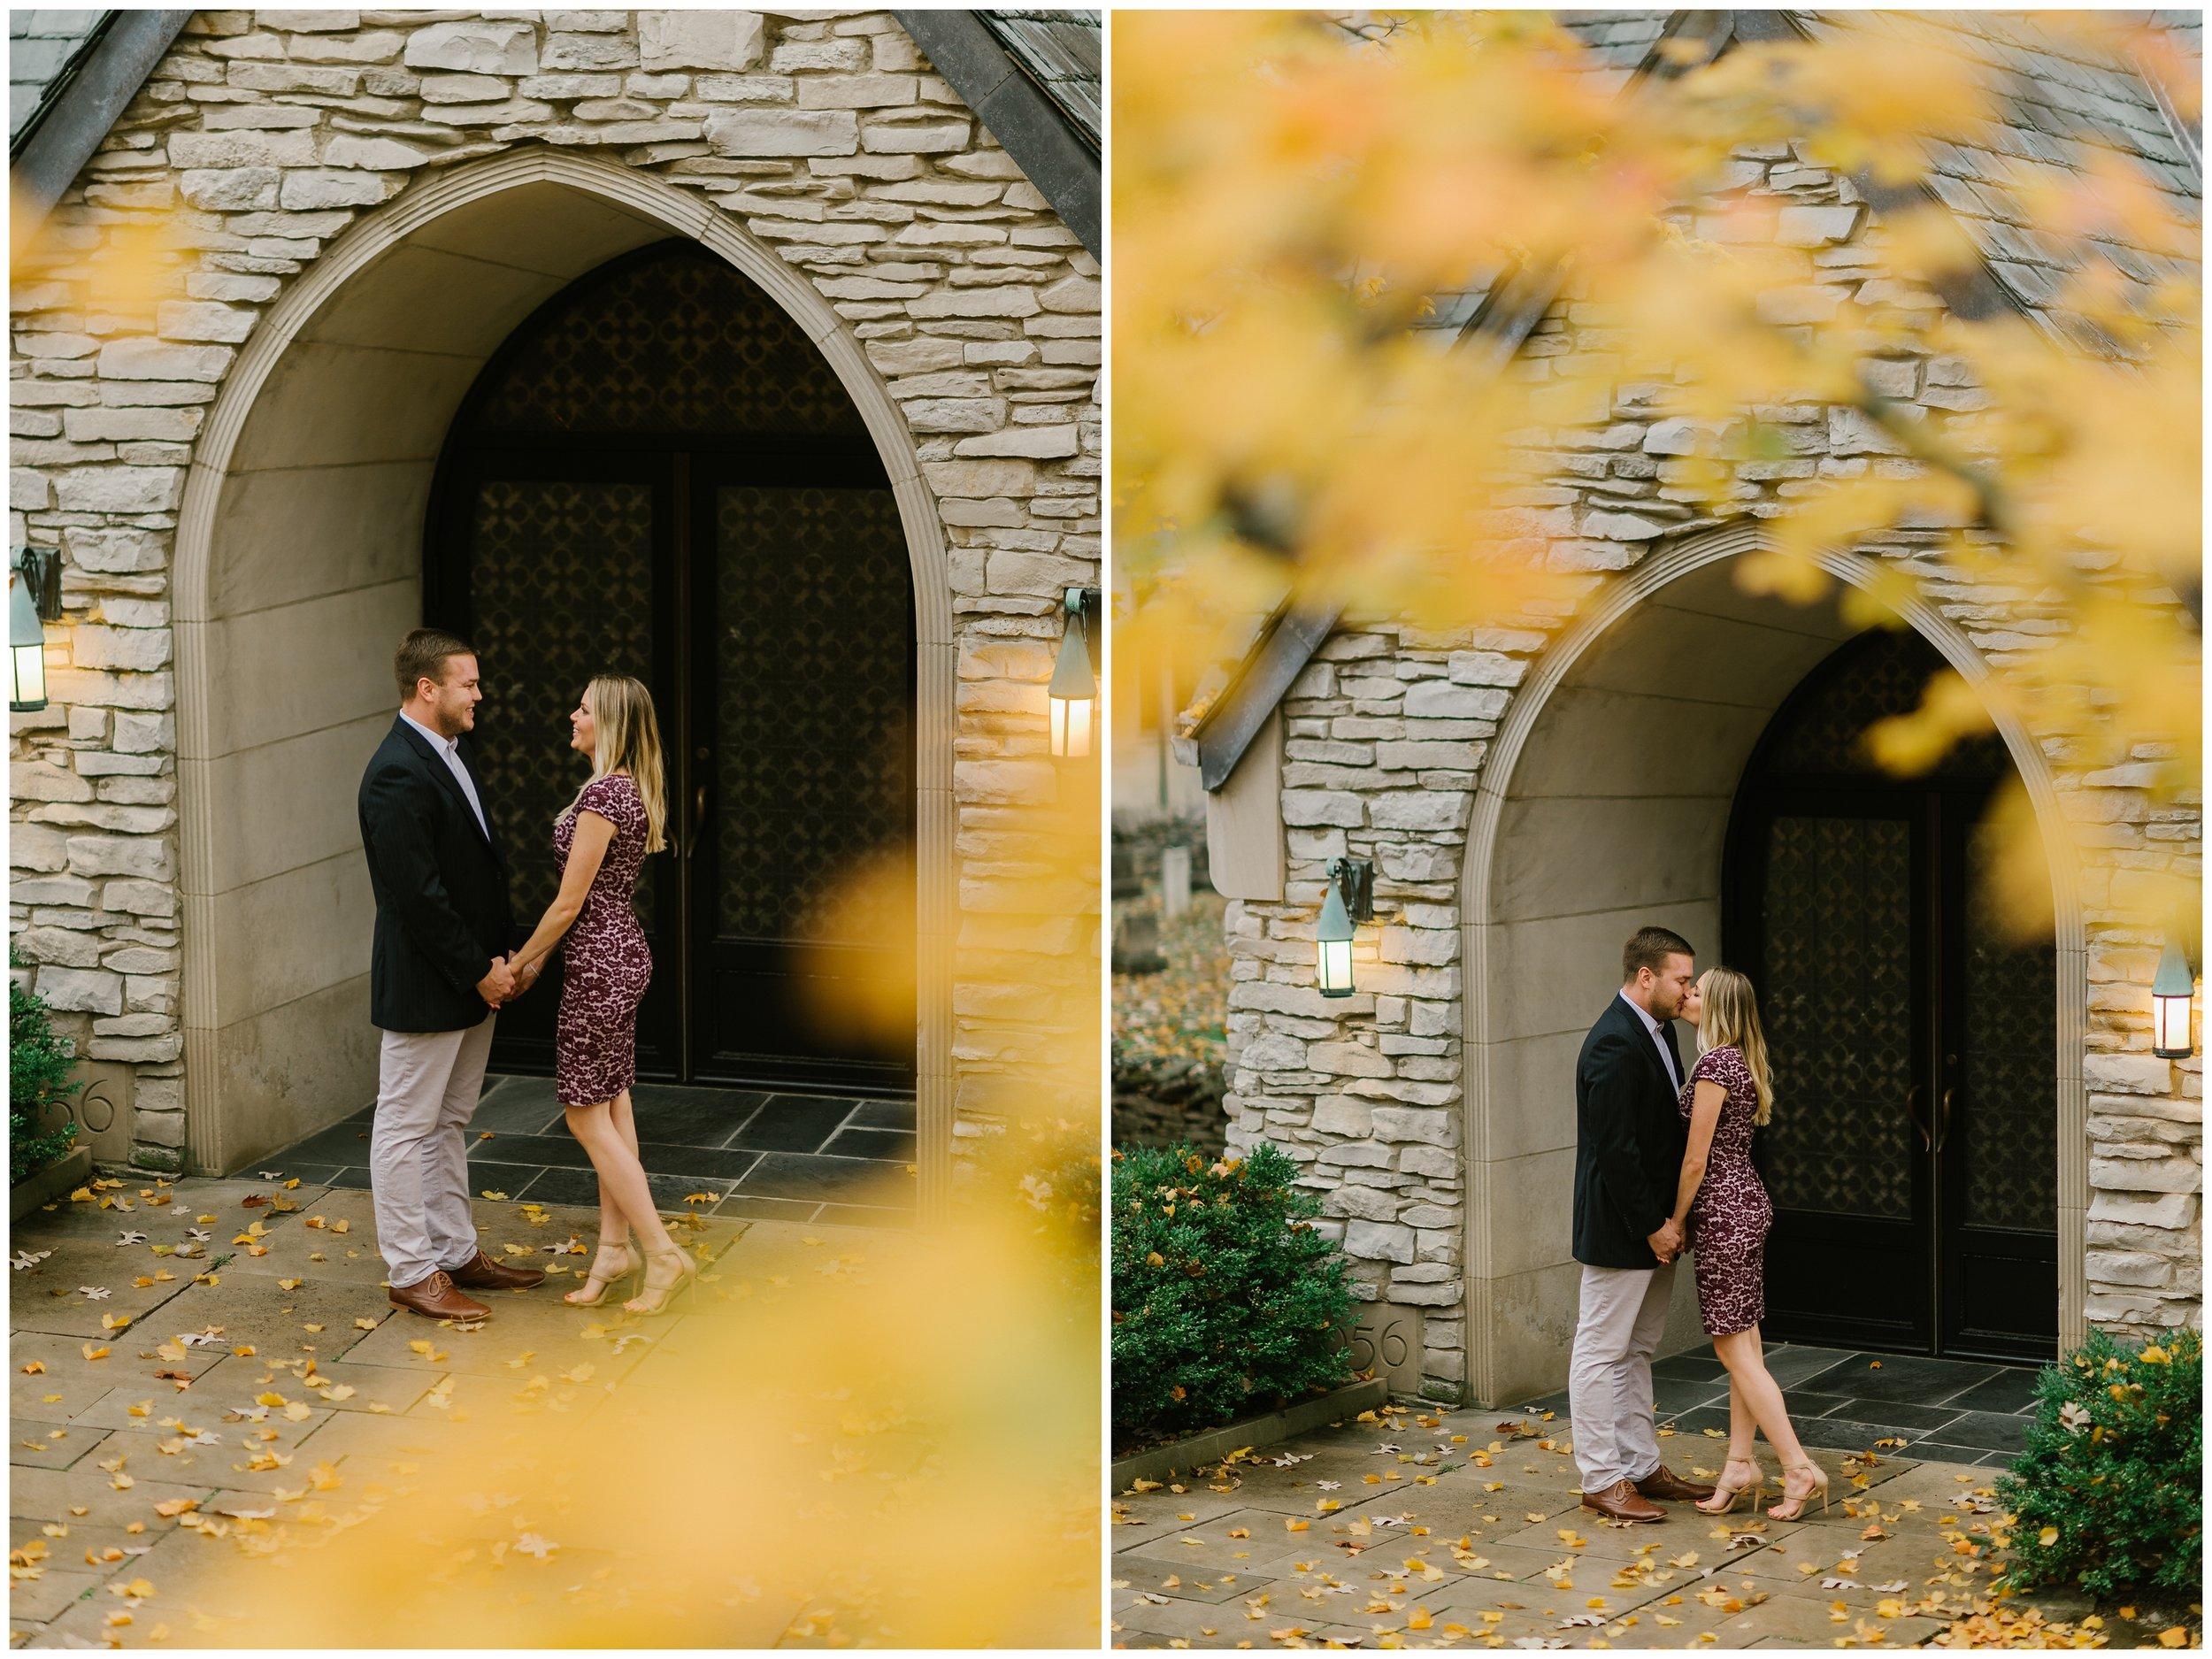 Rebecca_Shehorn_Photography_Indianapolis_Wedding_Photographer_7687.jpg